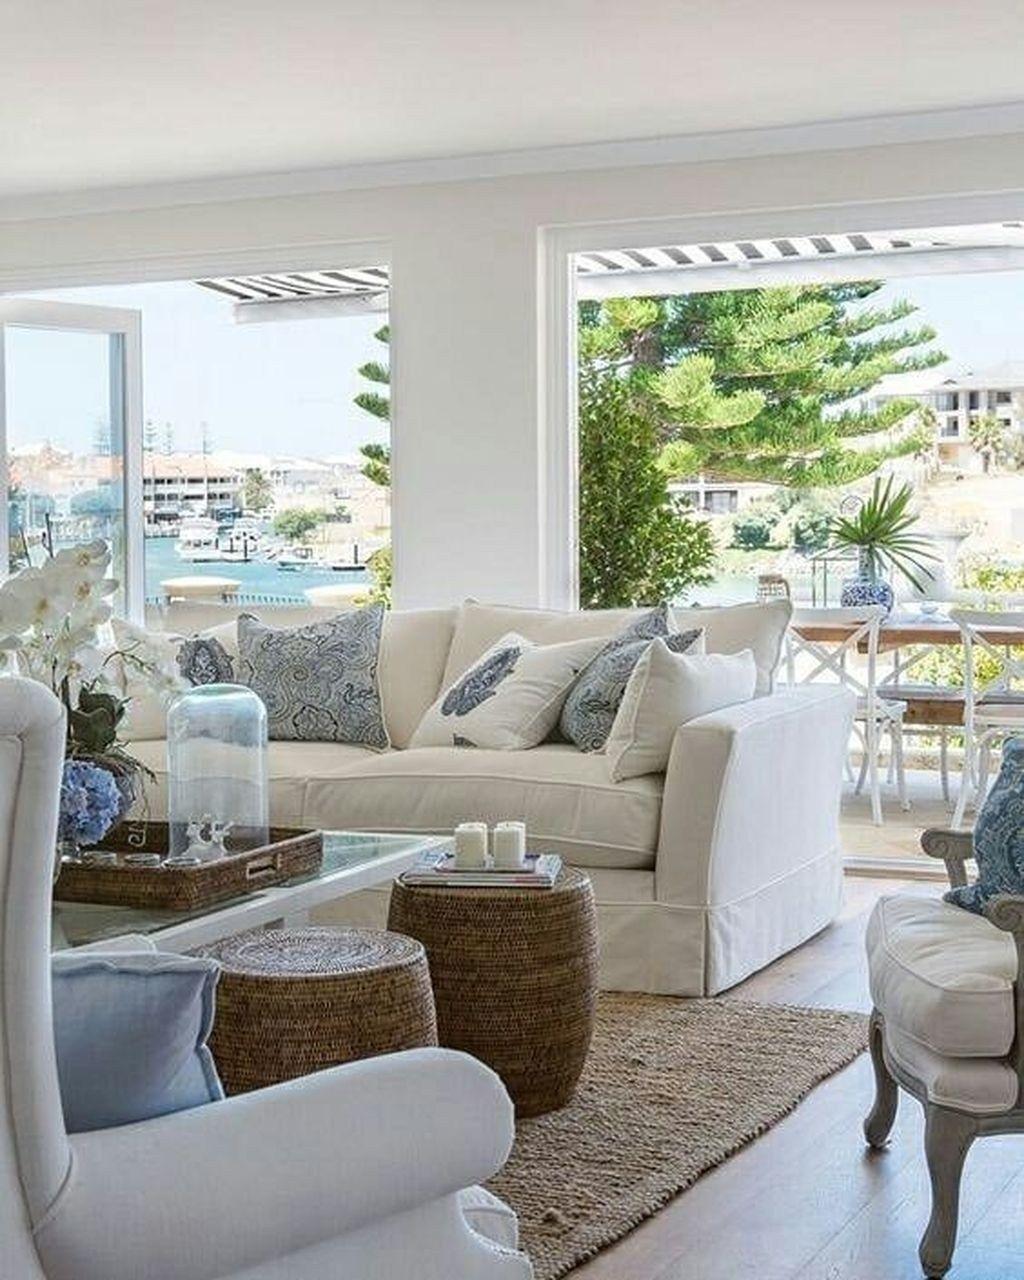 50 Lovely Rustic Coastal Living Room Design Ideas: 50 Elegant House Decor Ideas